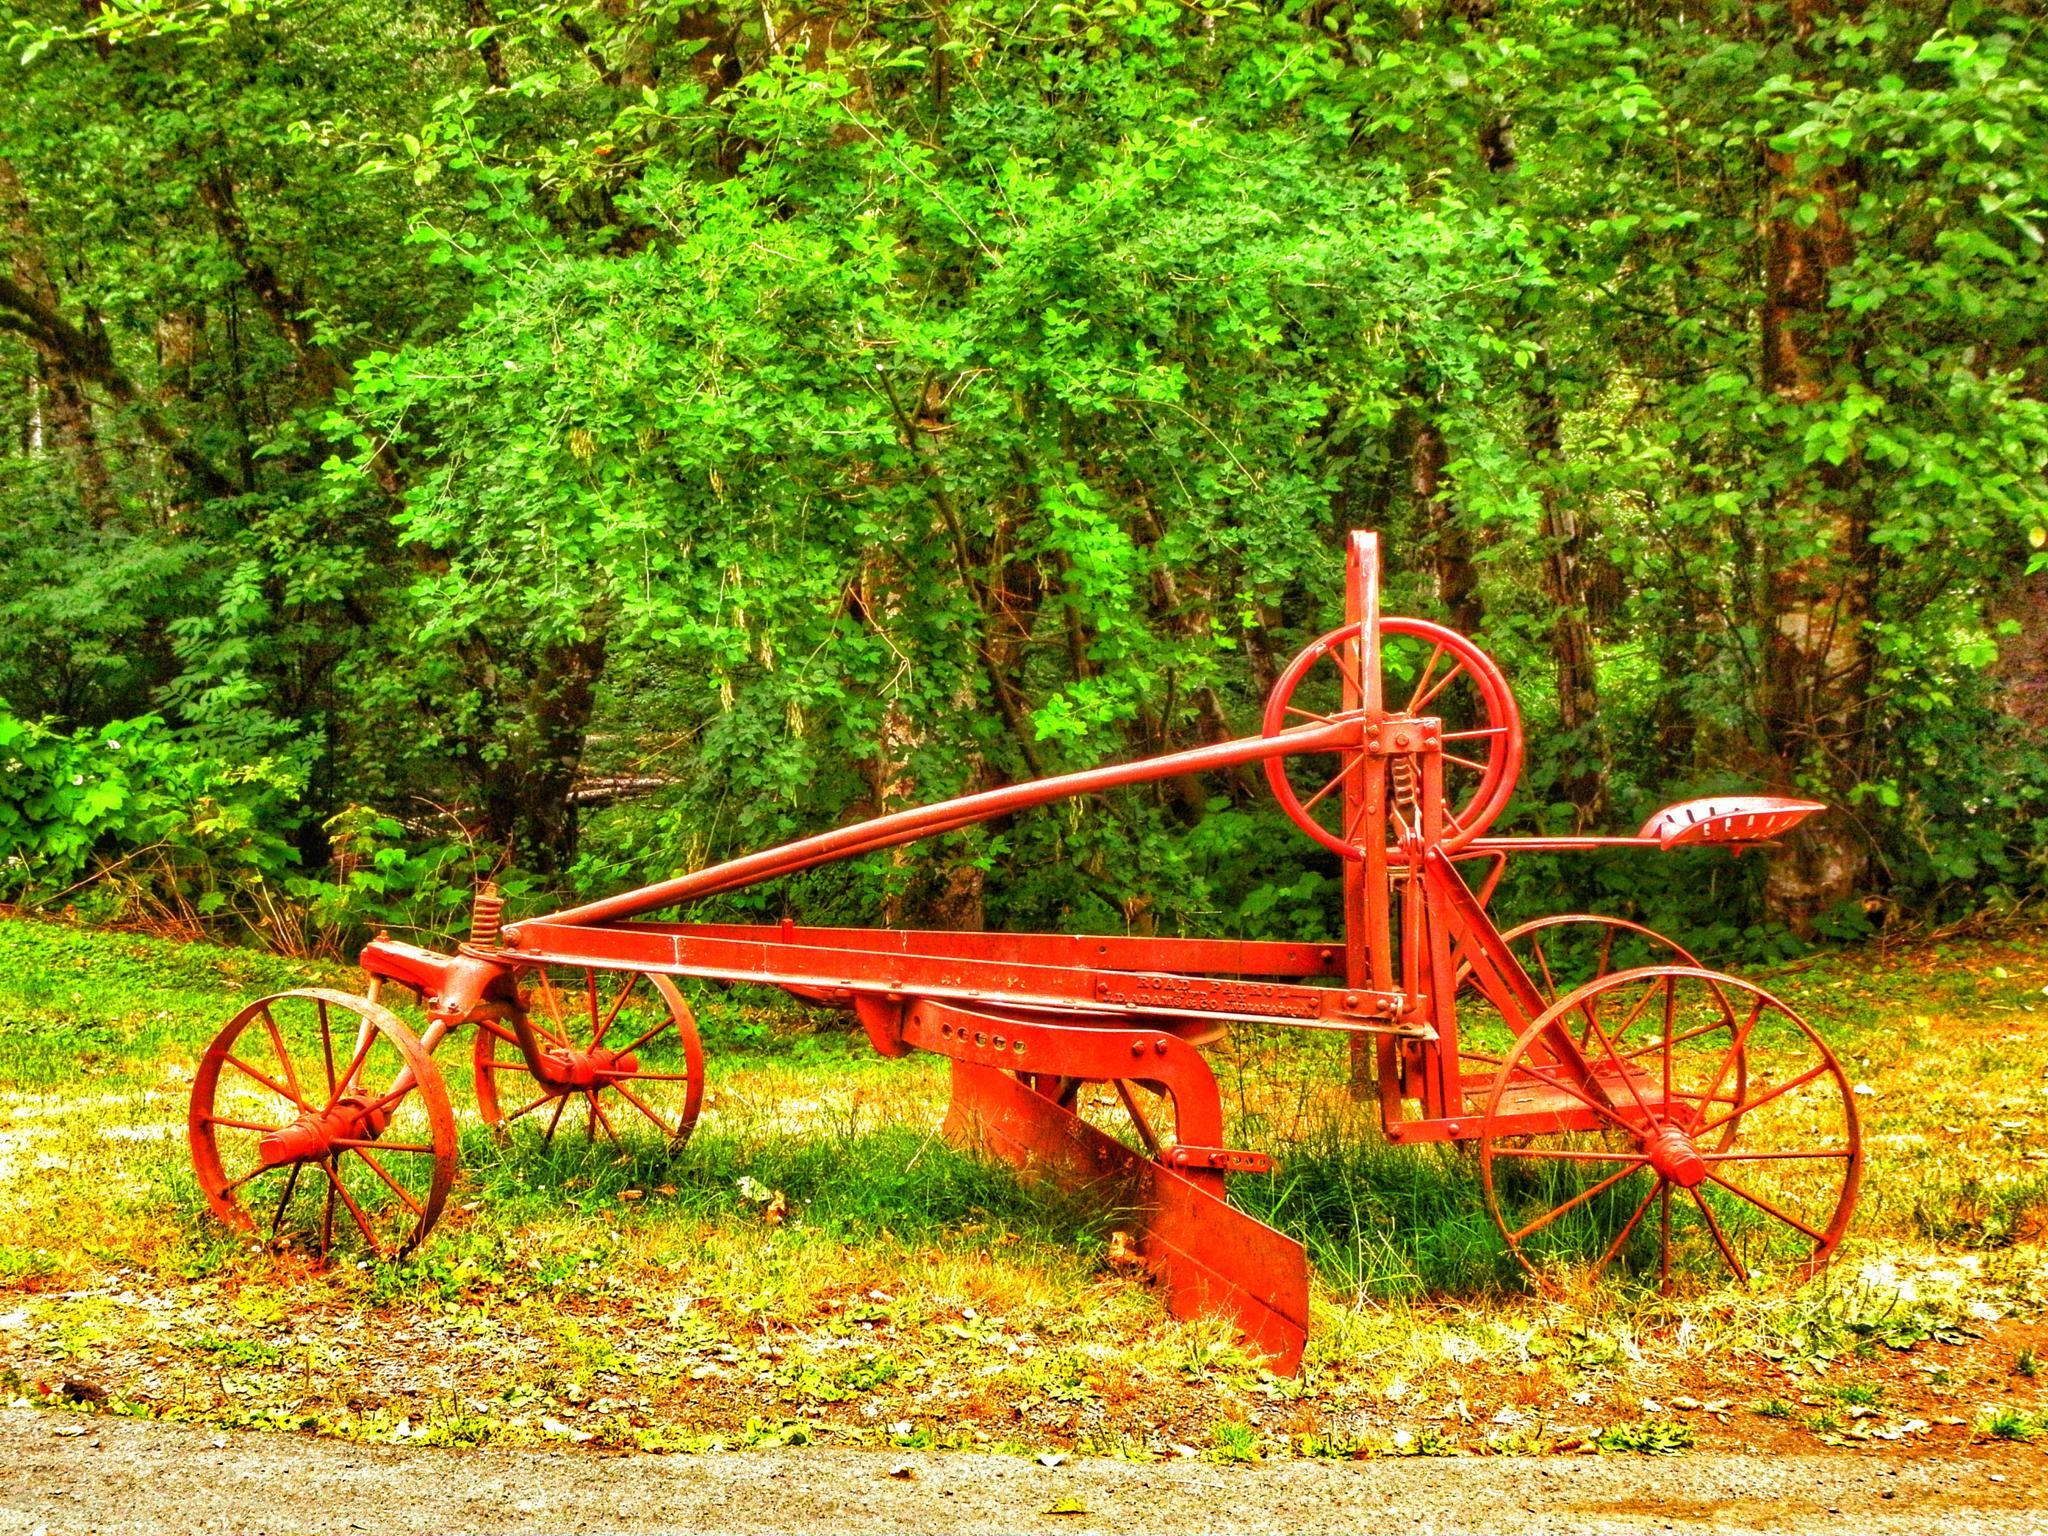 Antique Farm equipment by PMcWhirt